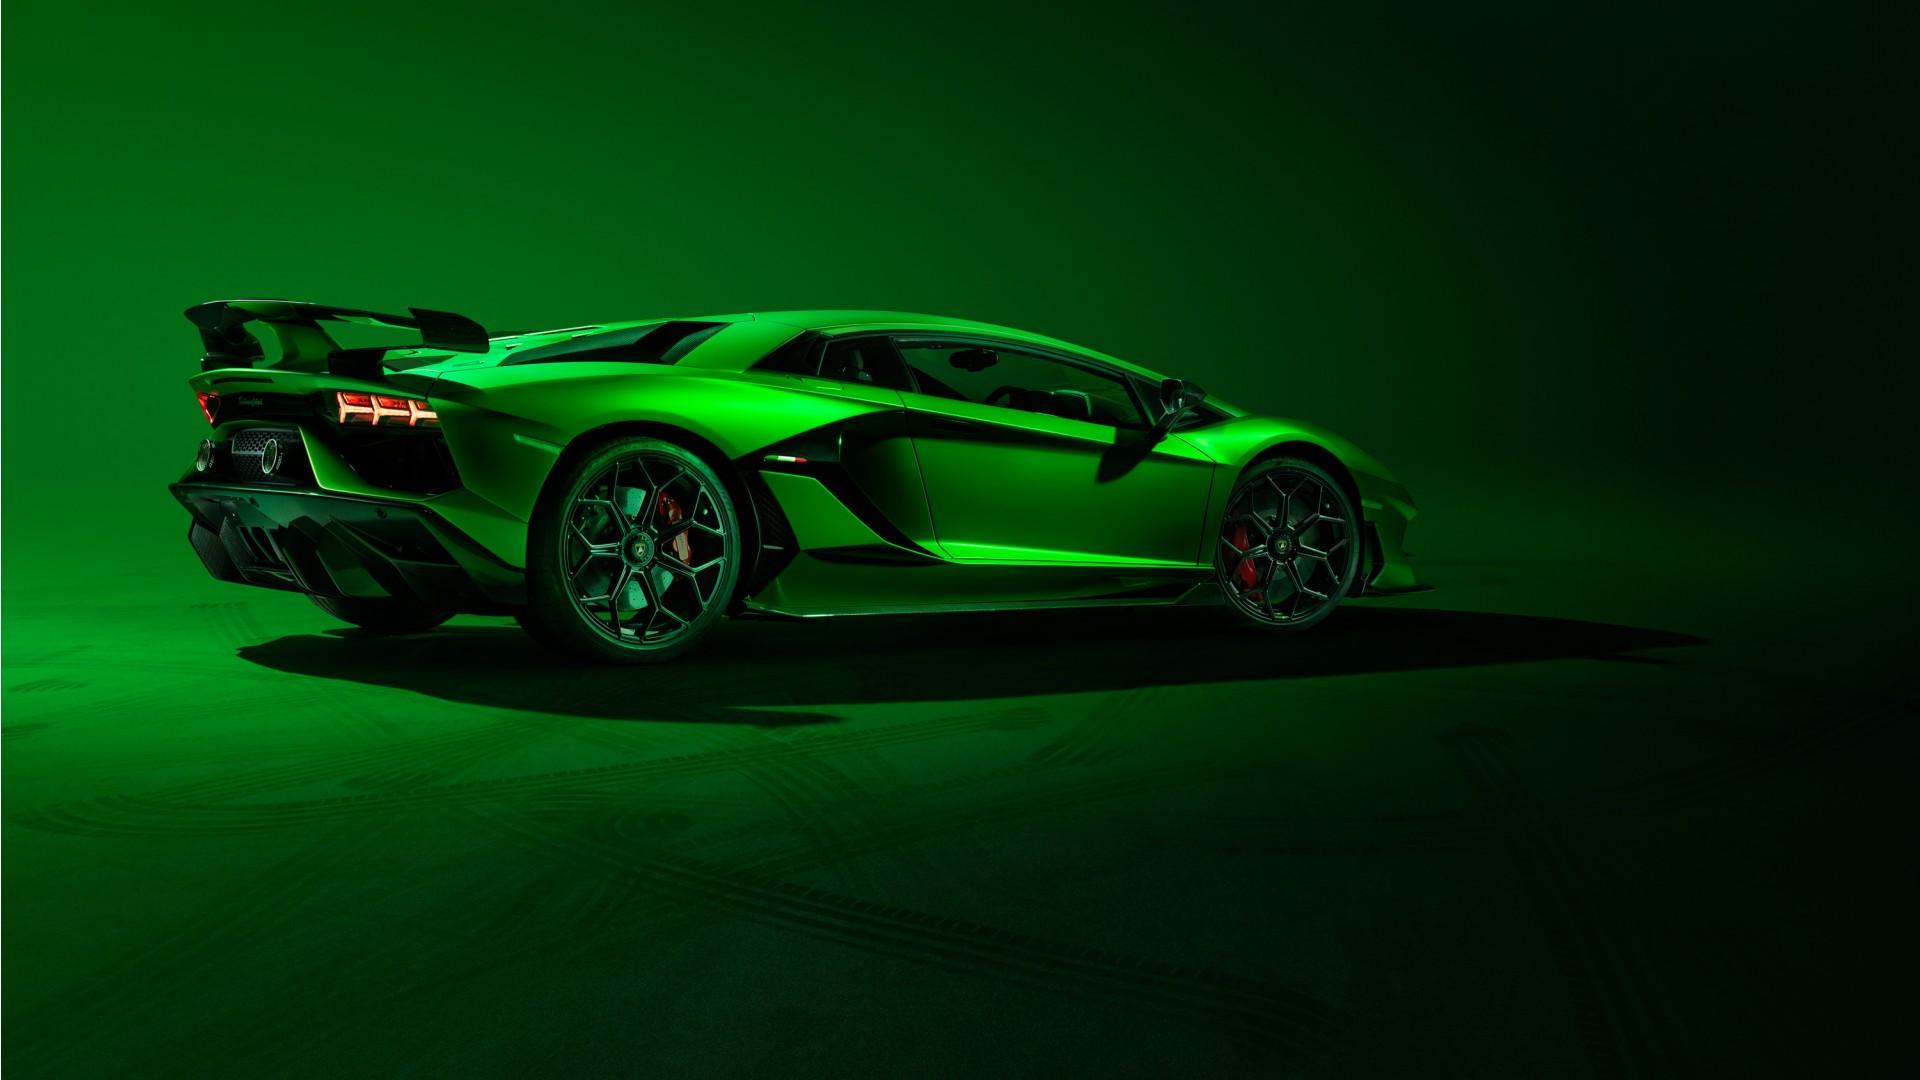 2019 Lamborghini Aventador SVJ 3 Wallpaper | HD Car ...